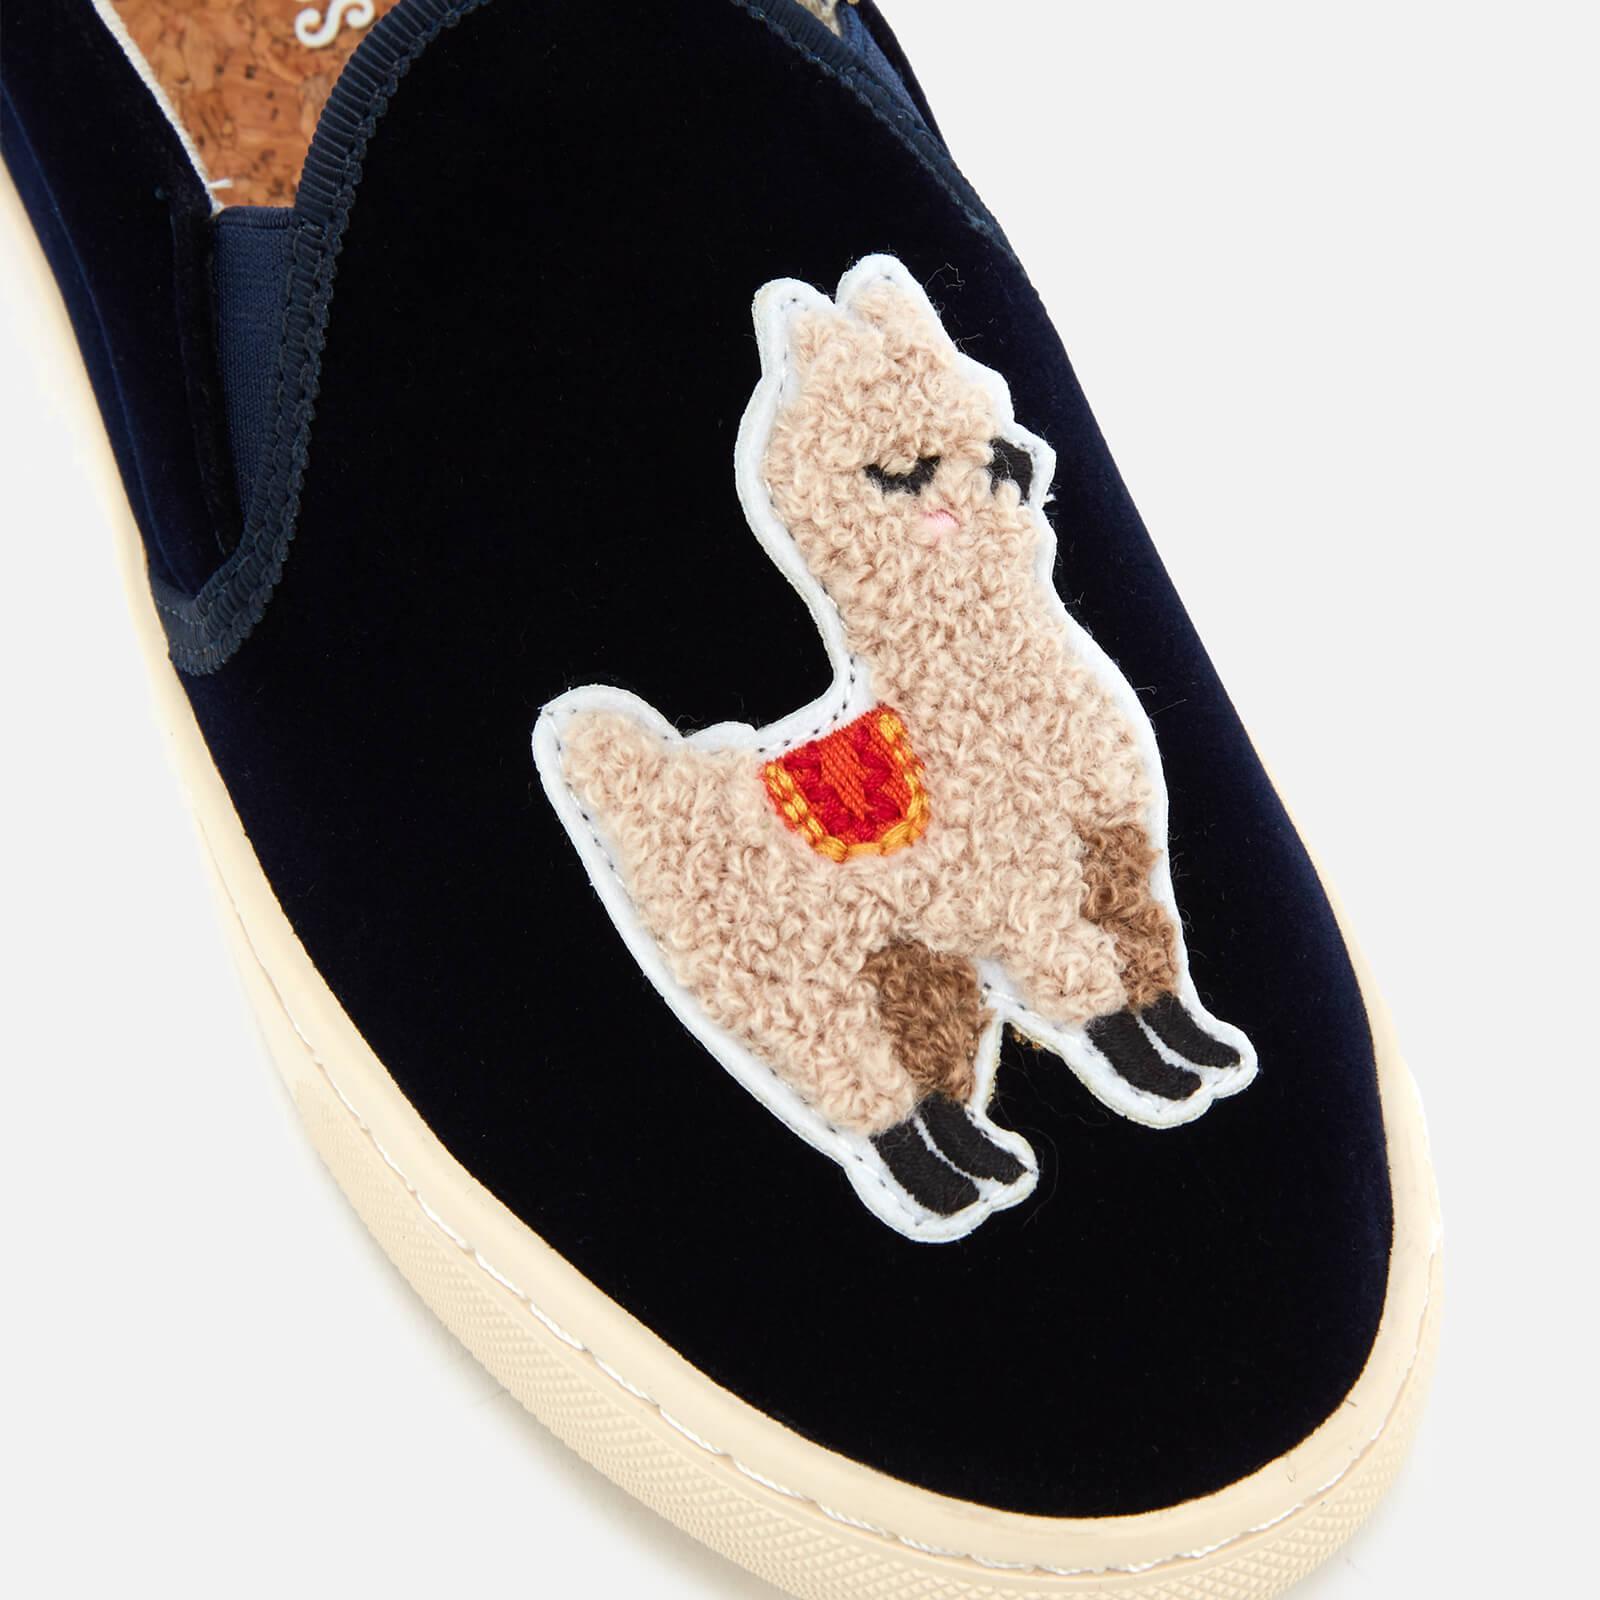 Soludos Velvet Llama Sneaker in Navy (Blue) - Save 32%